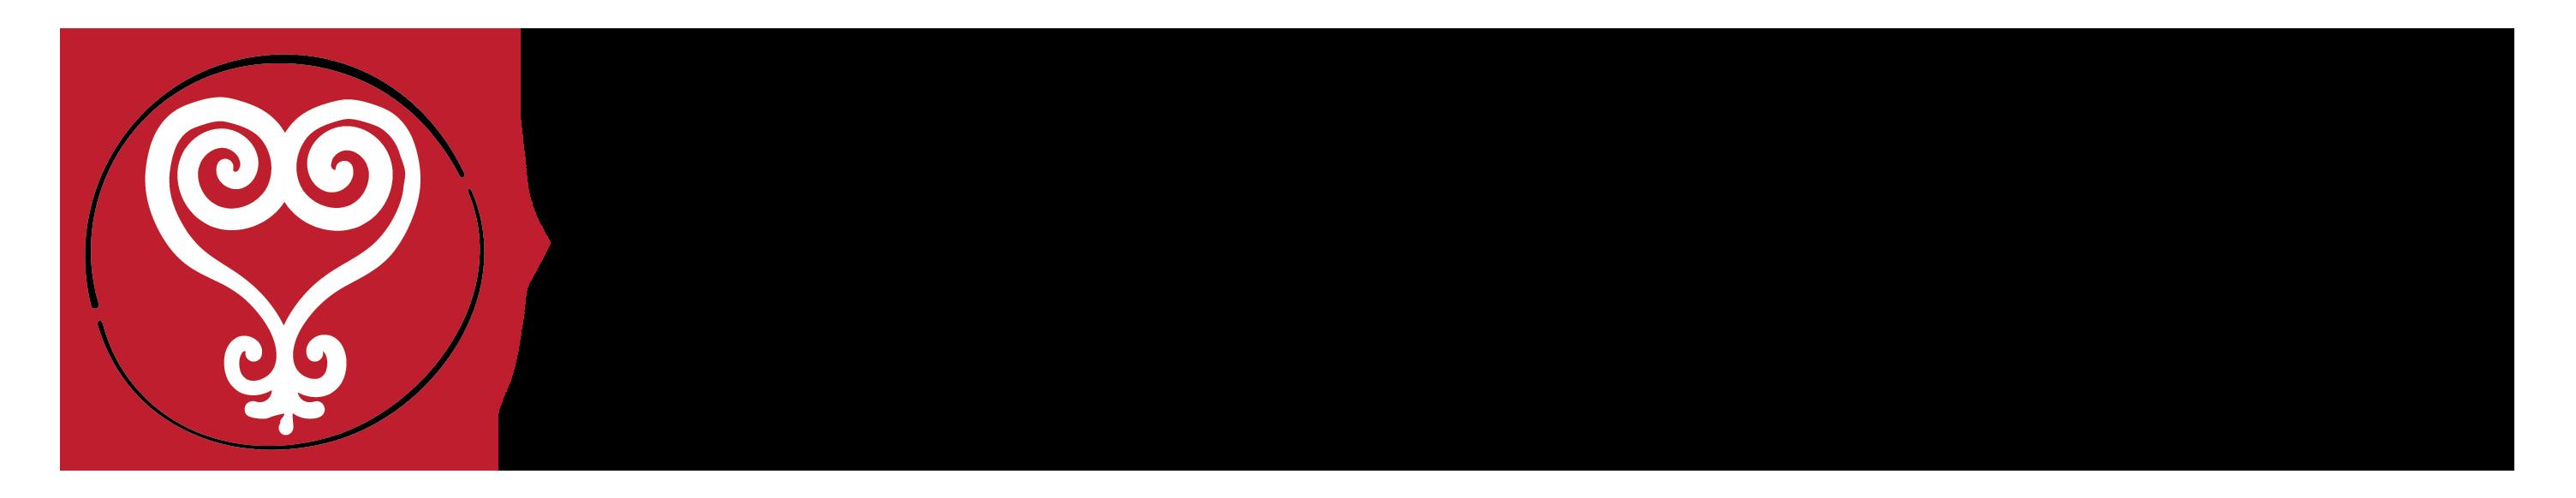 Sankofa-Logo-02